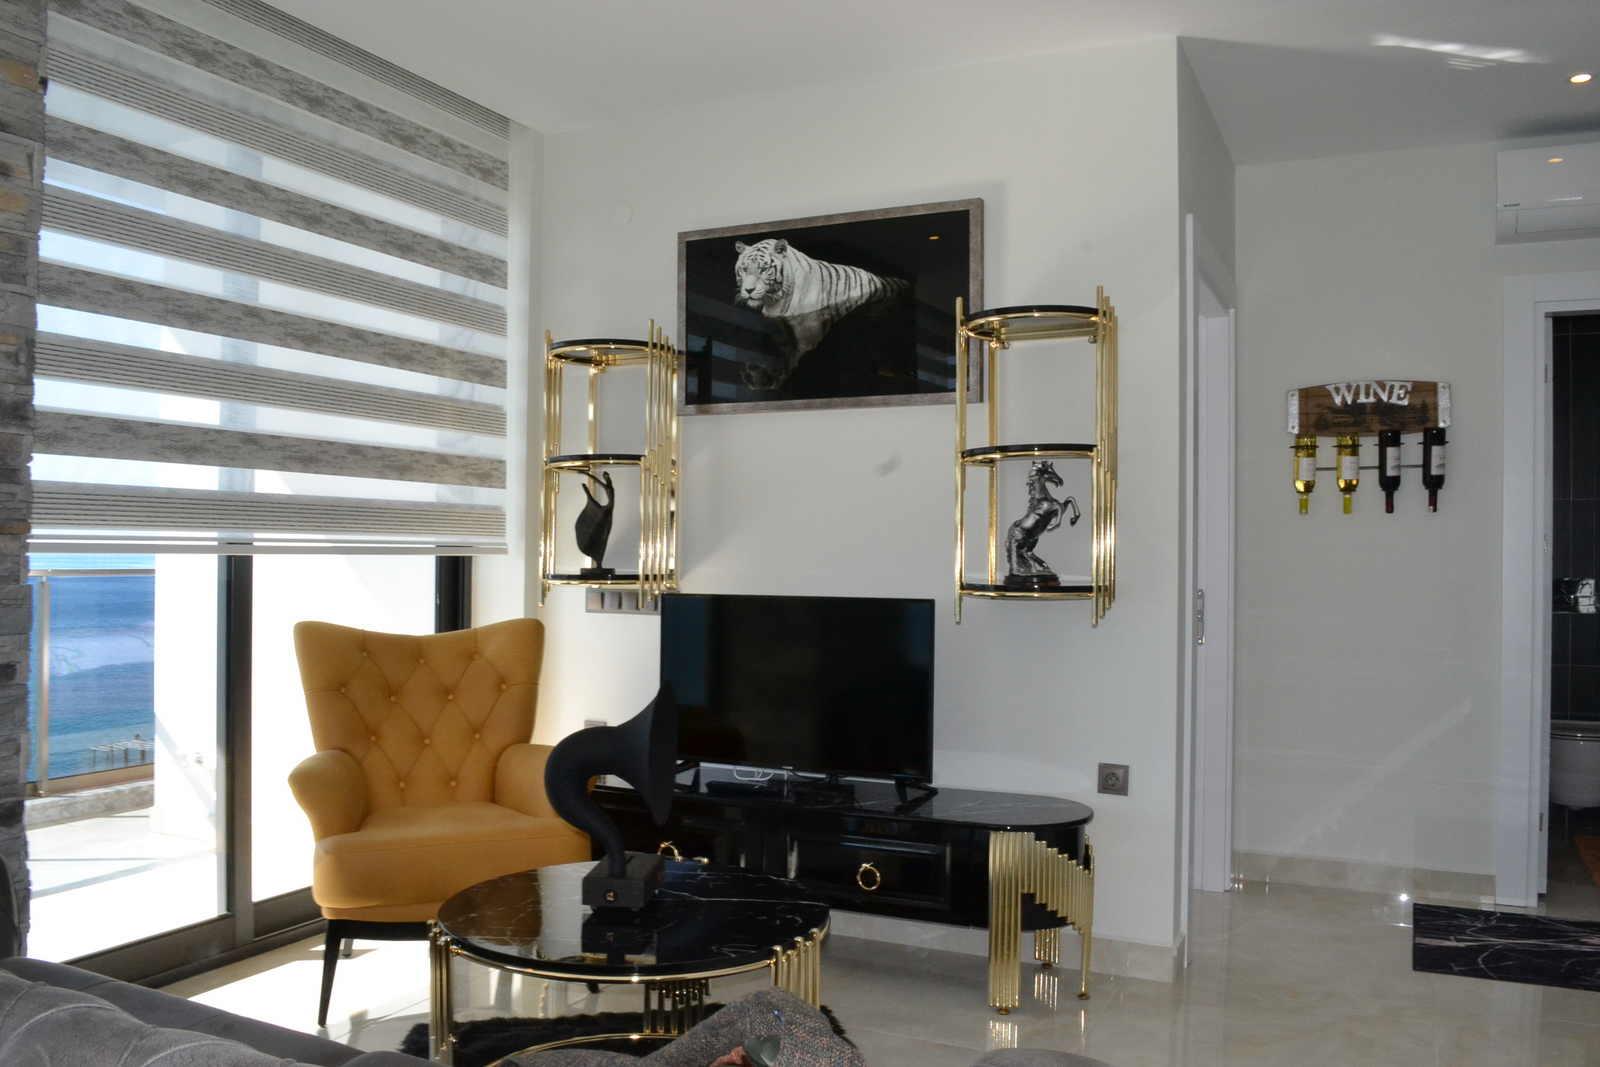 Алания Махмутлар Продажа Квартиры 2+1 в Резиденции Класса Люкс